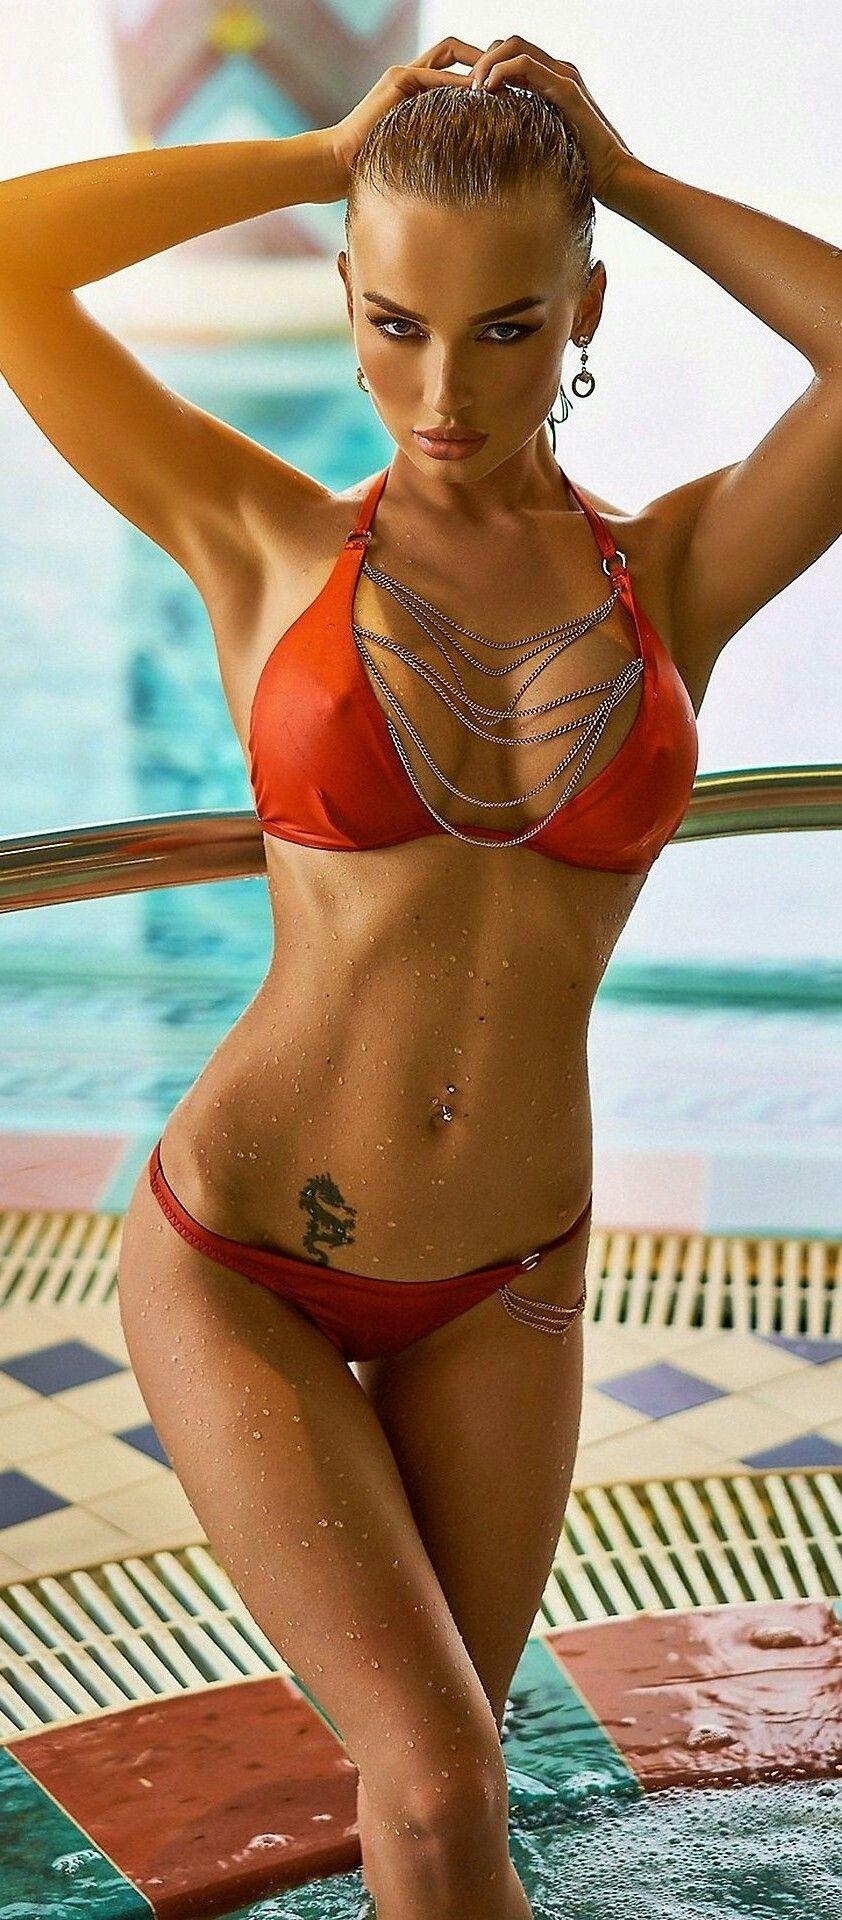 Instagram Bikini Marina BrBikini naked photo 2017